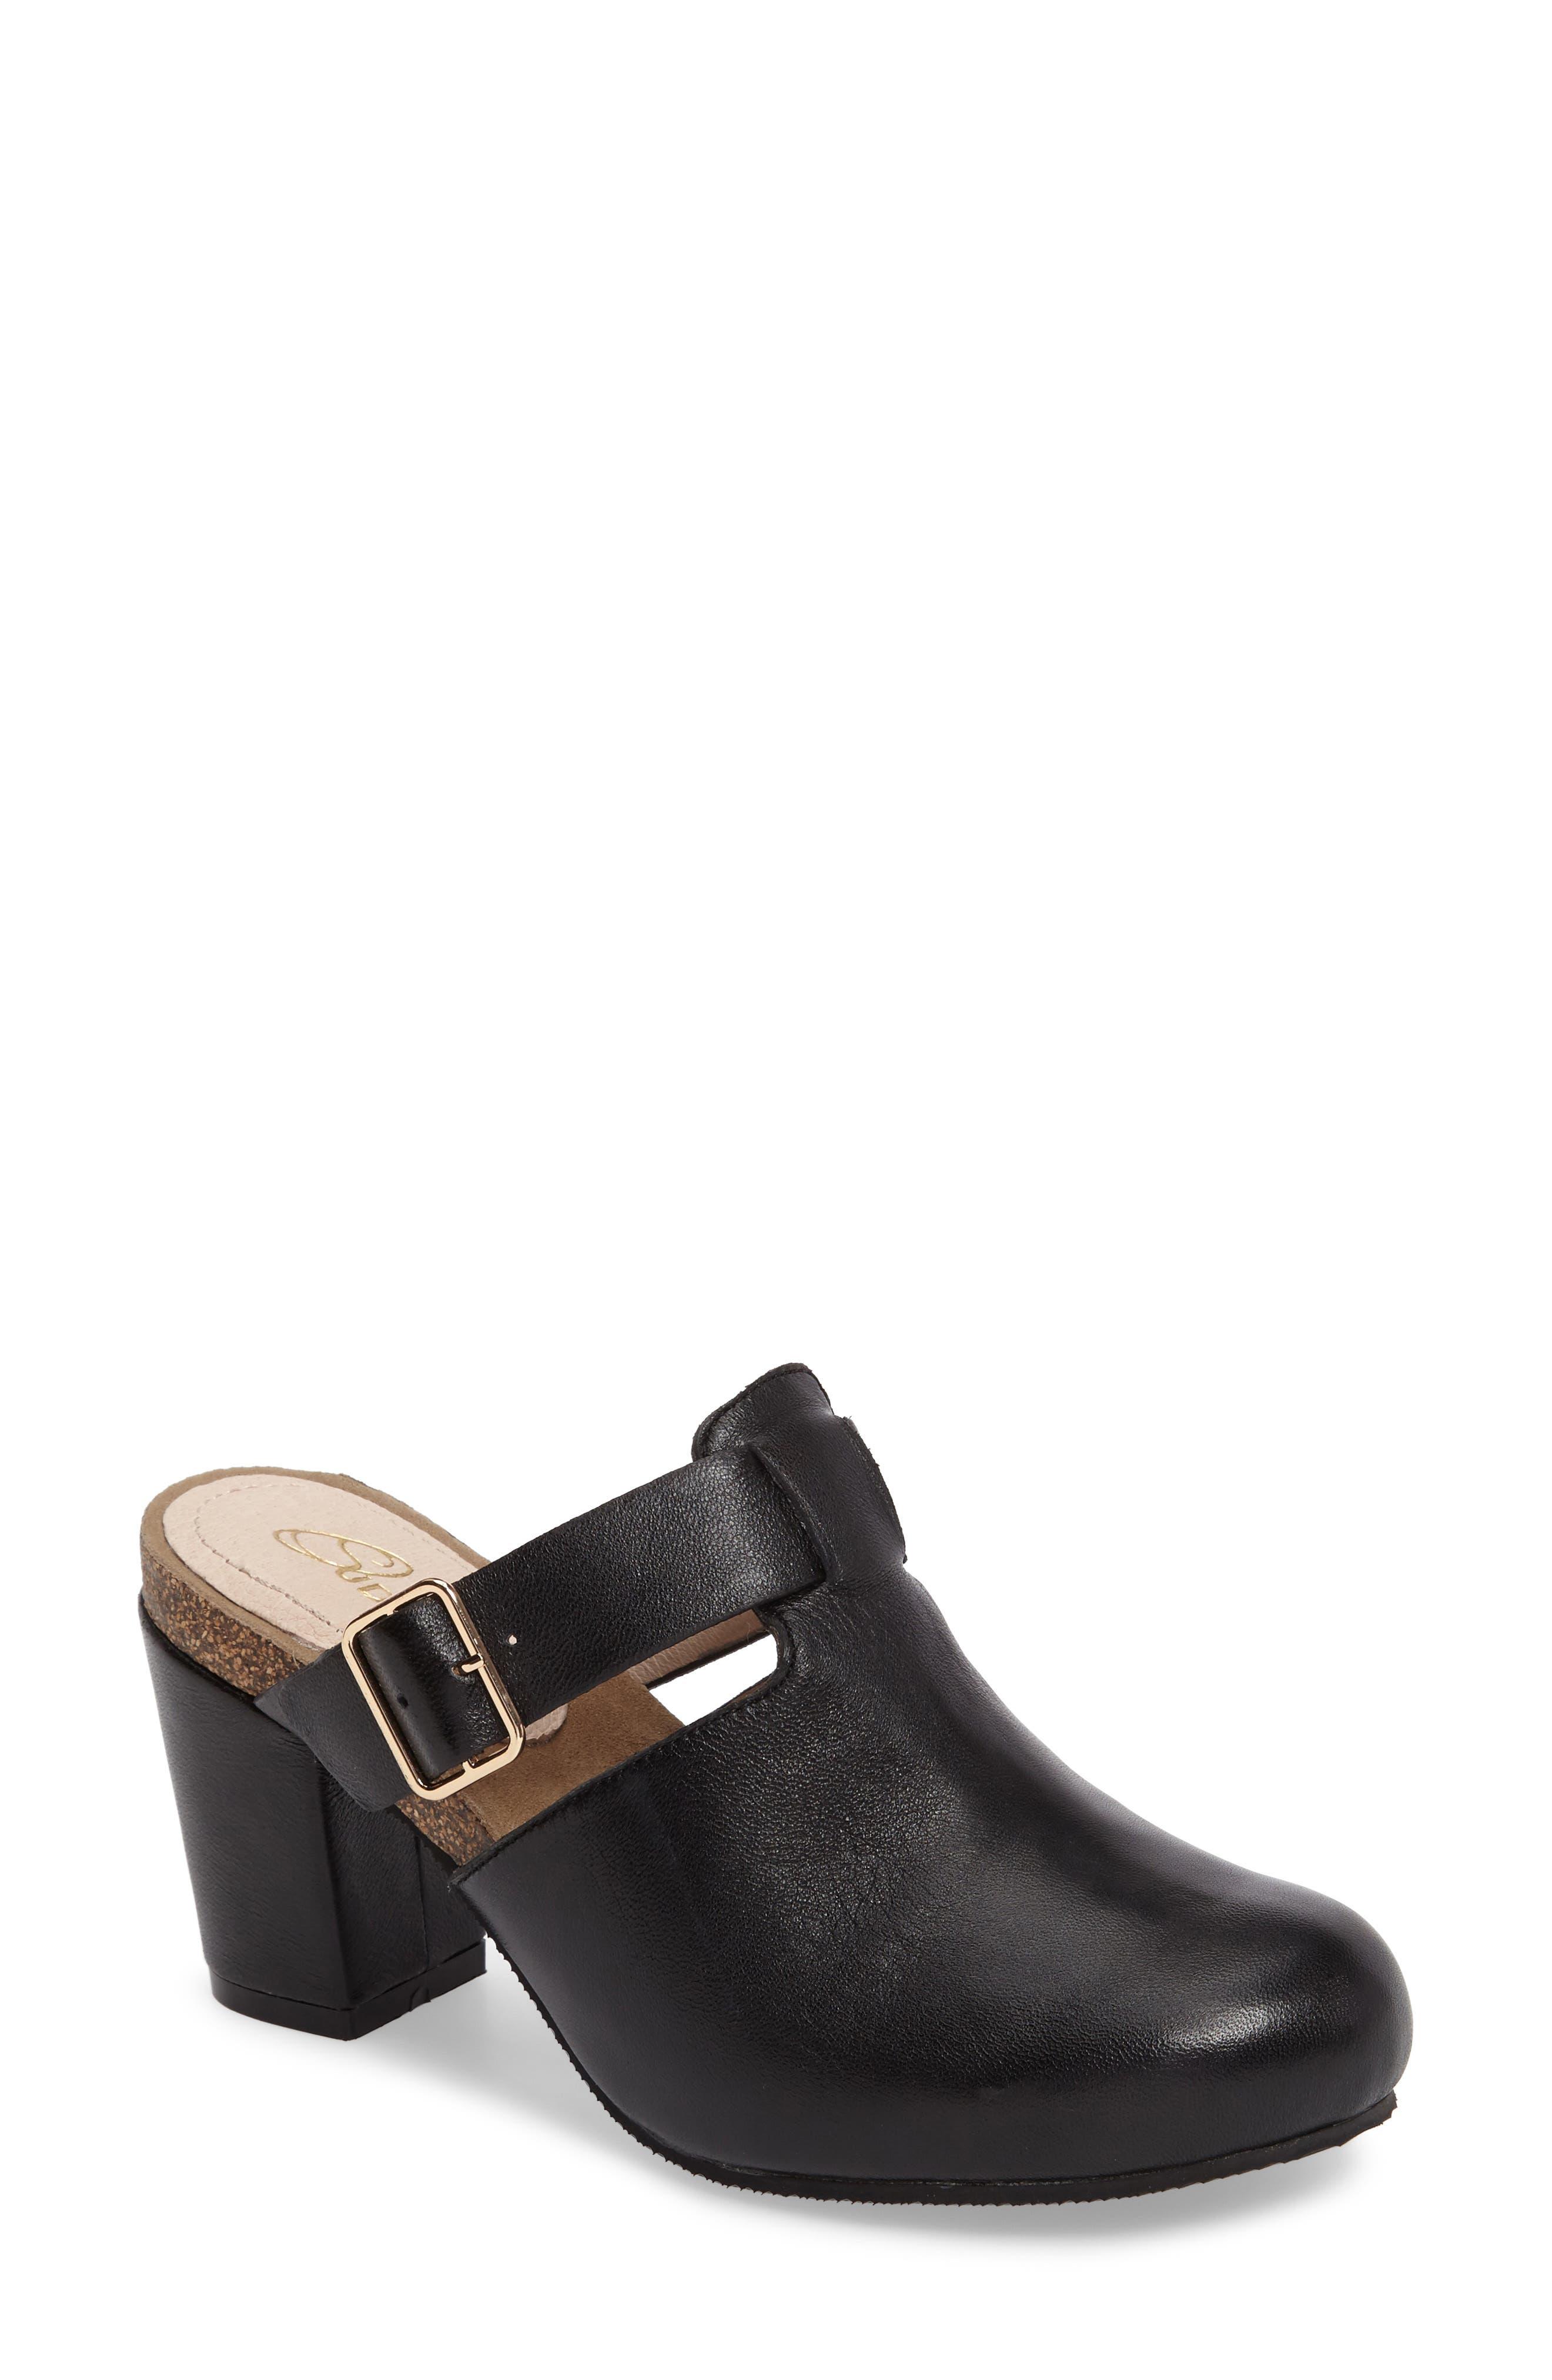 Cindy Block Heel Mule,                         Main,                         color, Black Leather